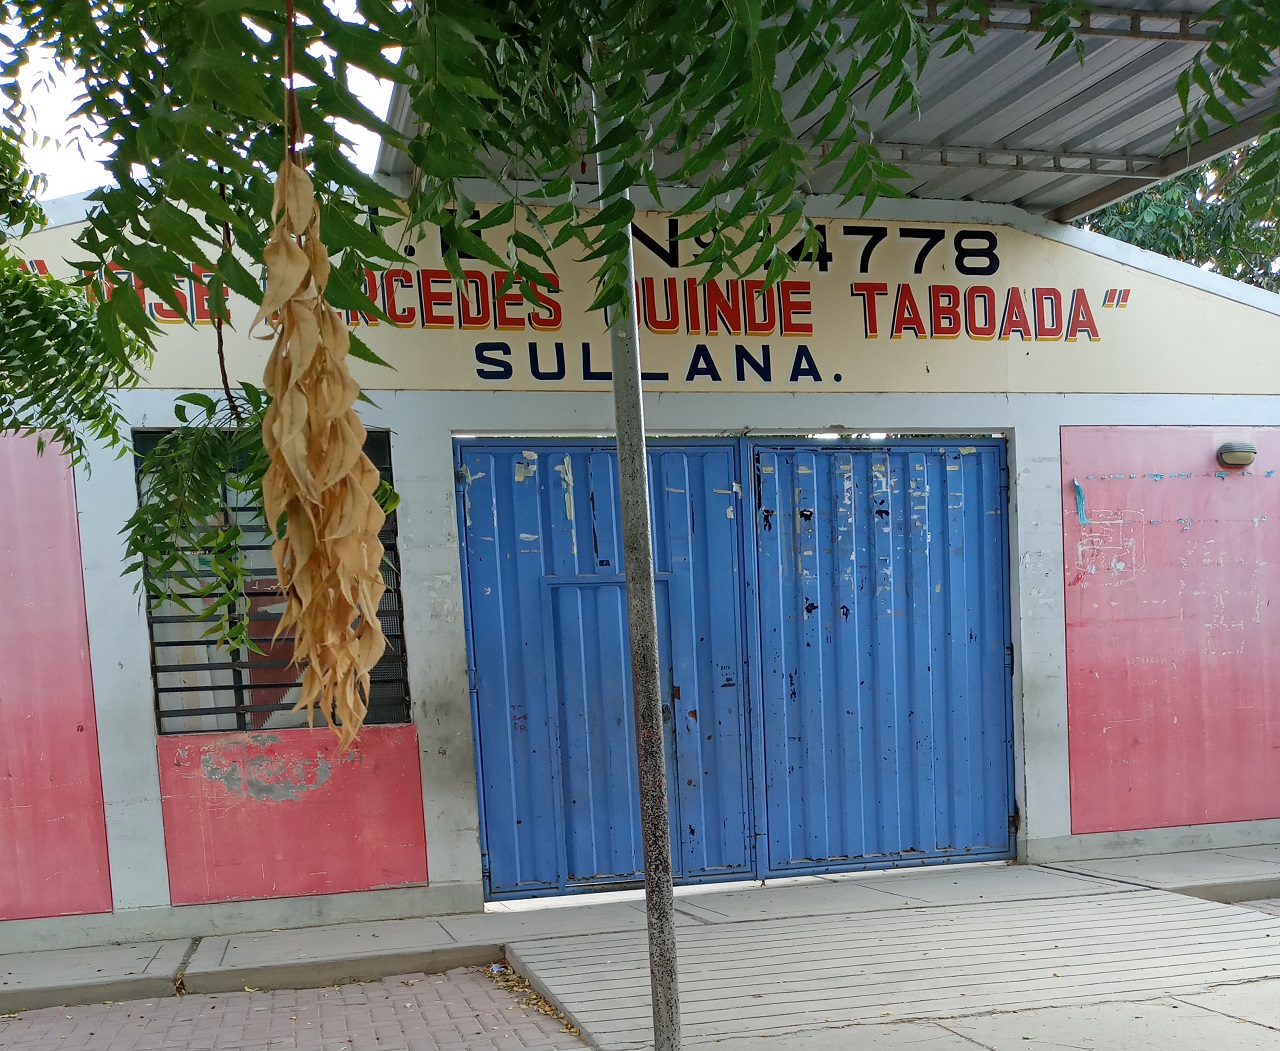 Escuela 14778 JOSE M. QUINDE TABOADA - Sullana